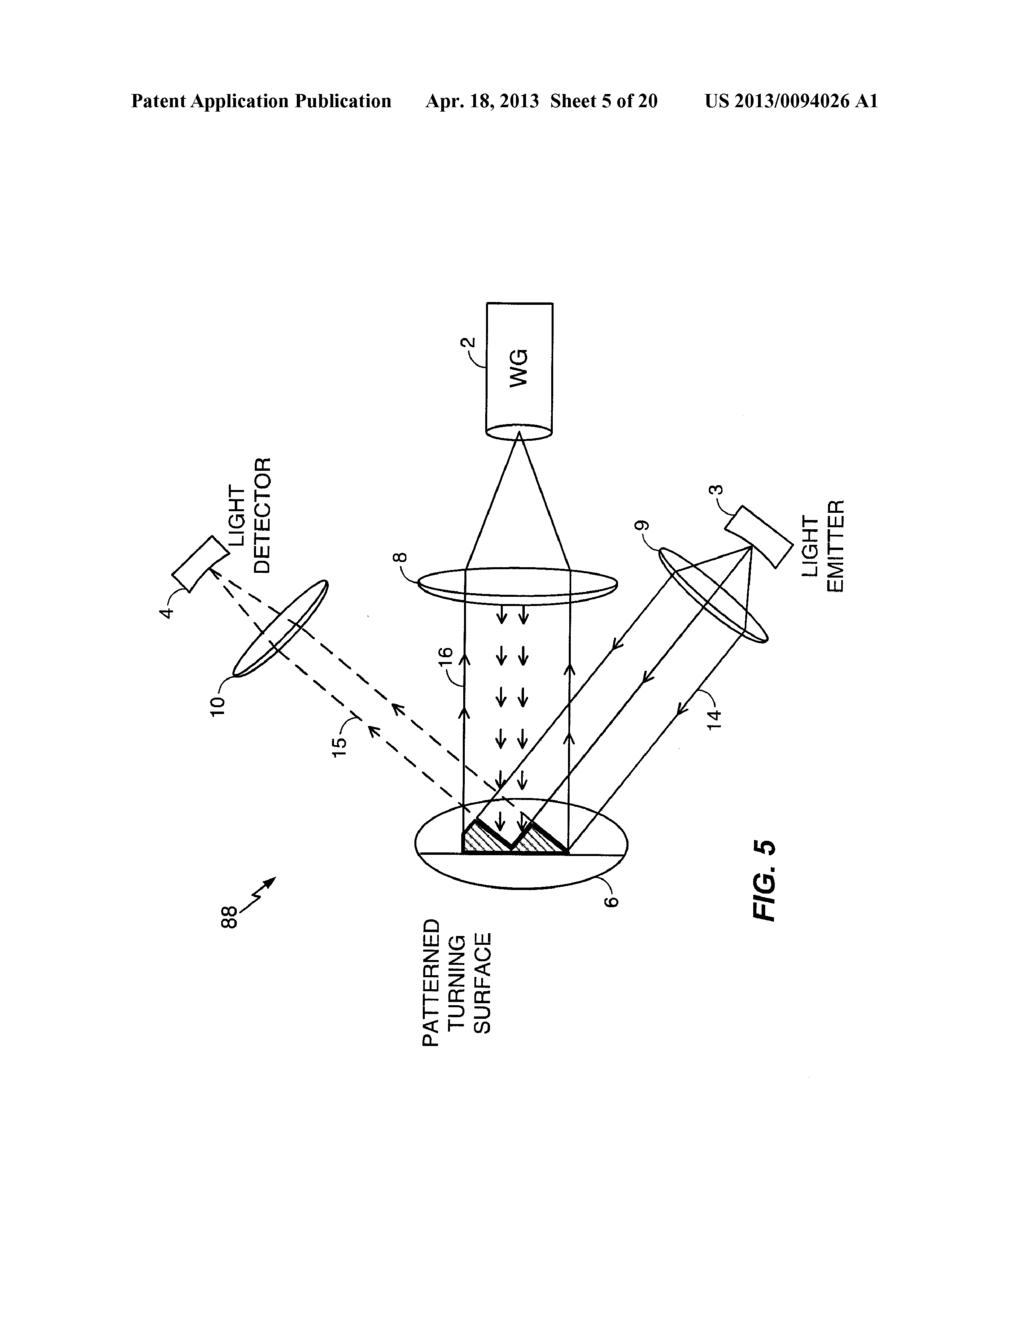 Fiber Optic Bi Directional Coupling Lens Diagram Schematic And Optics Showing How Light Can Image 06